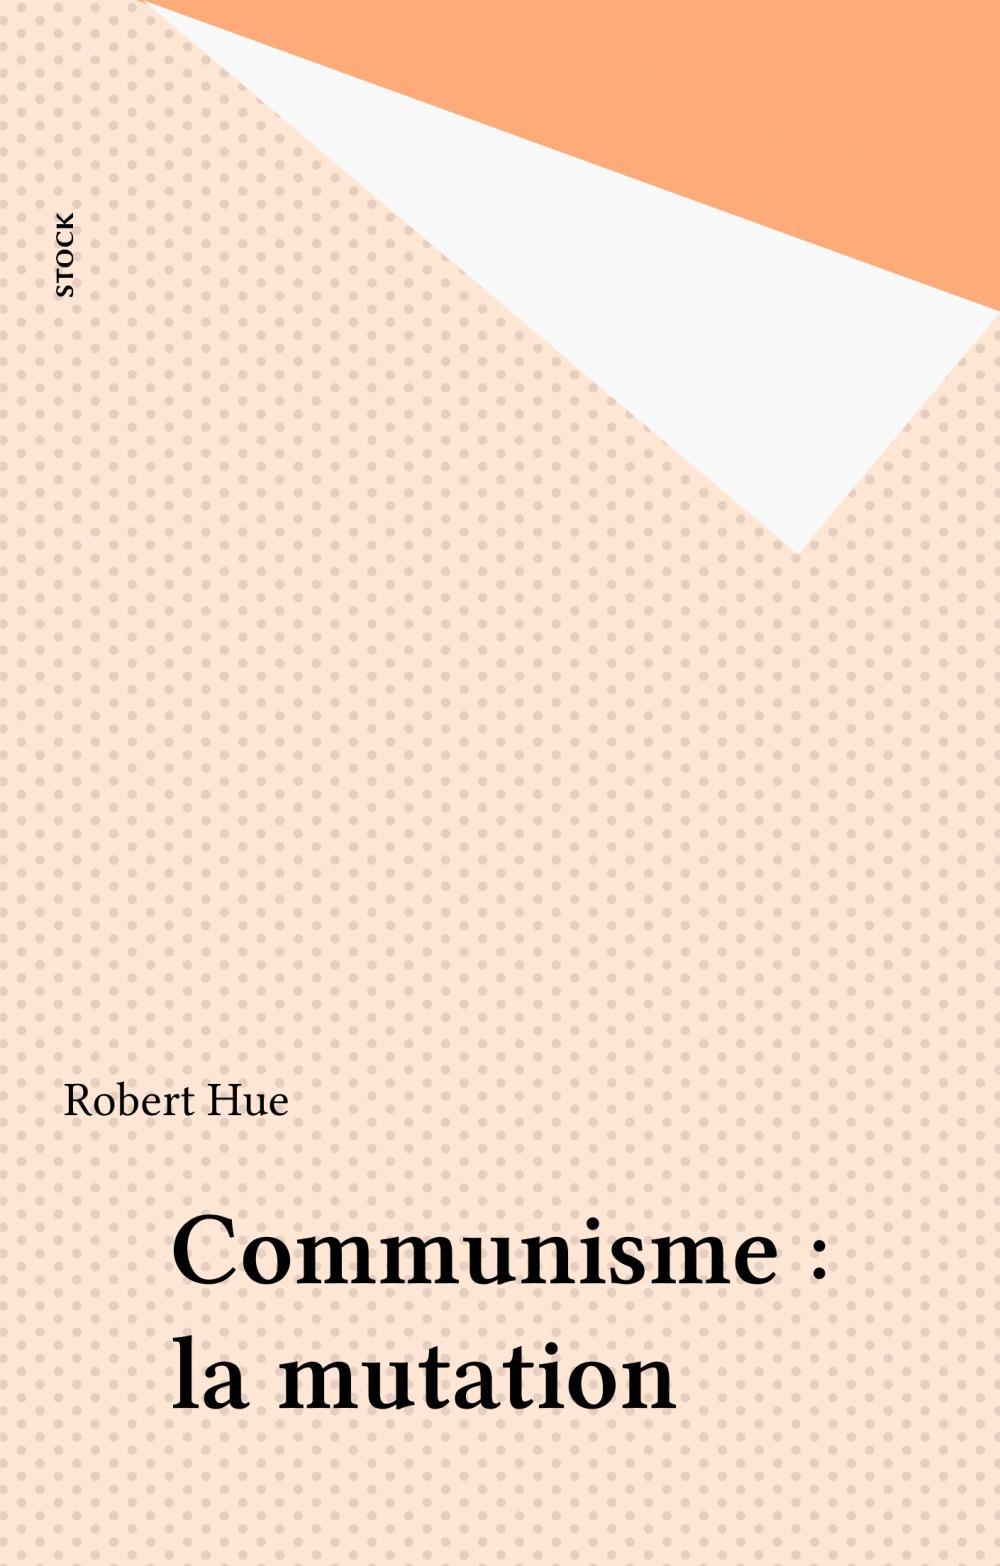 Communisme, la mutation